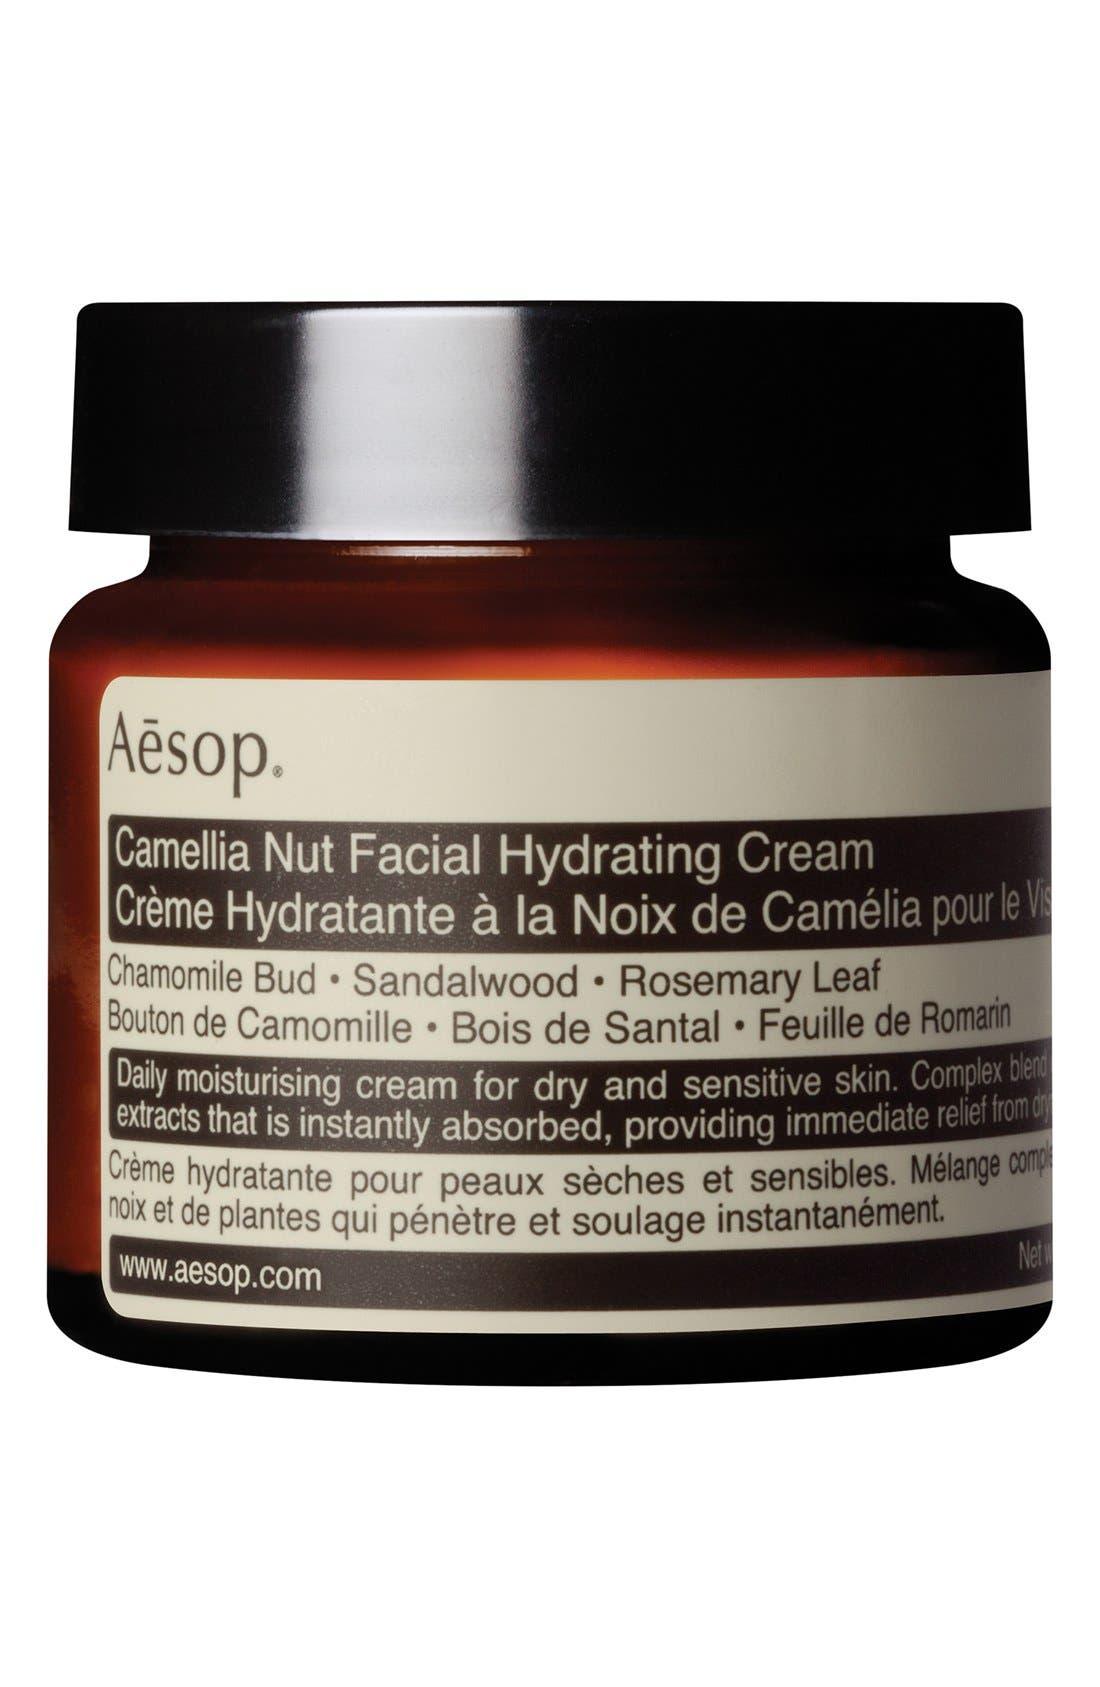 Camellia Nut Facial Hydrating Cream,                             Main thumbnail 1, color,                             NONE